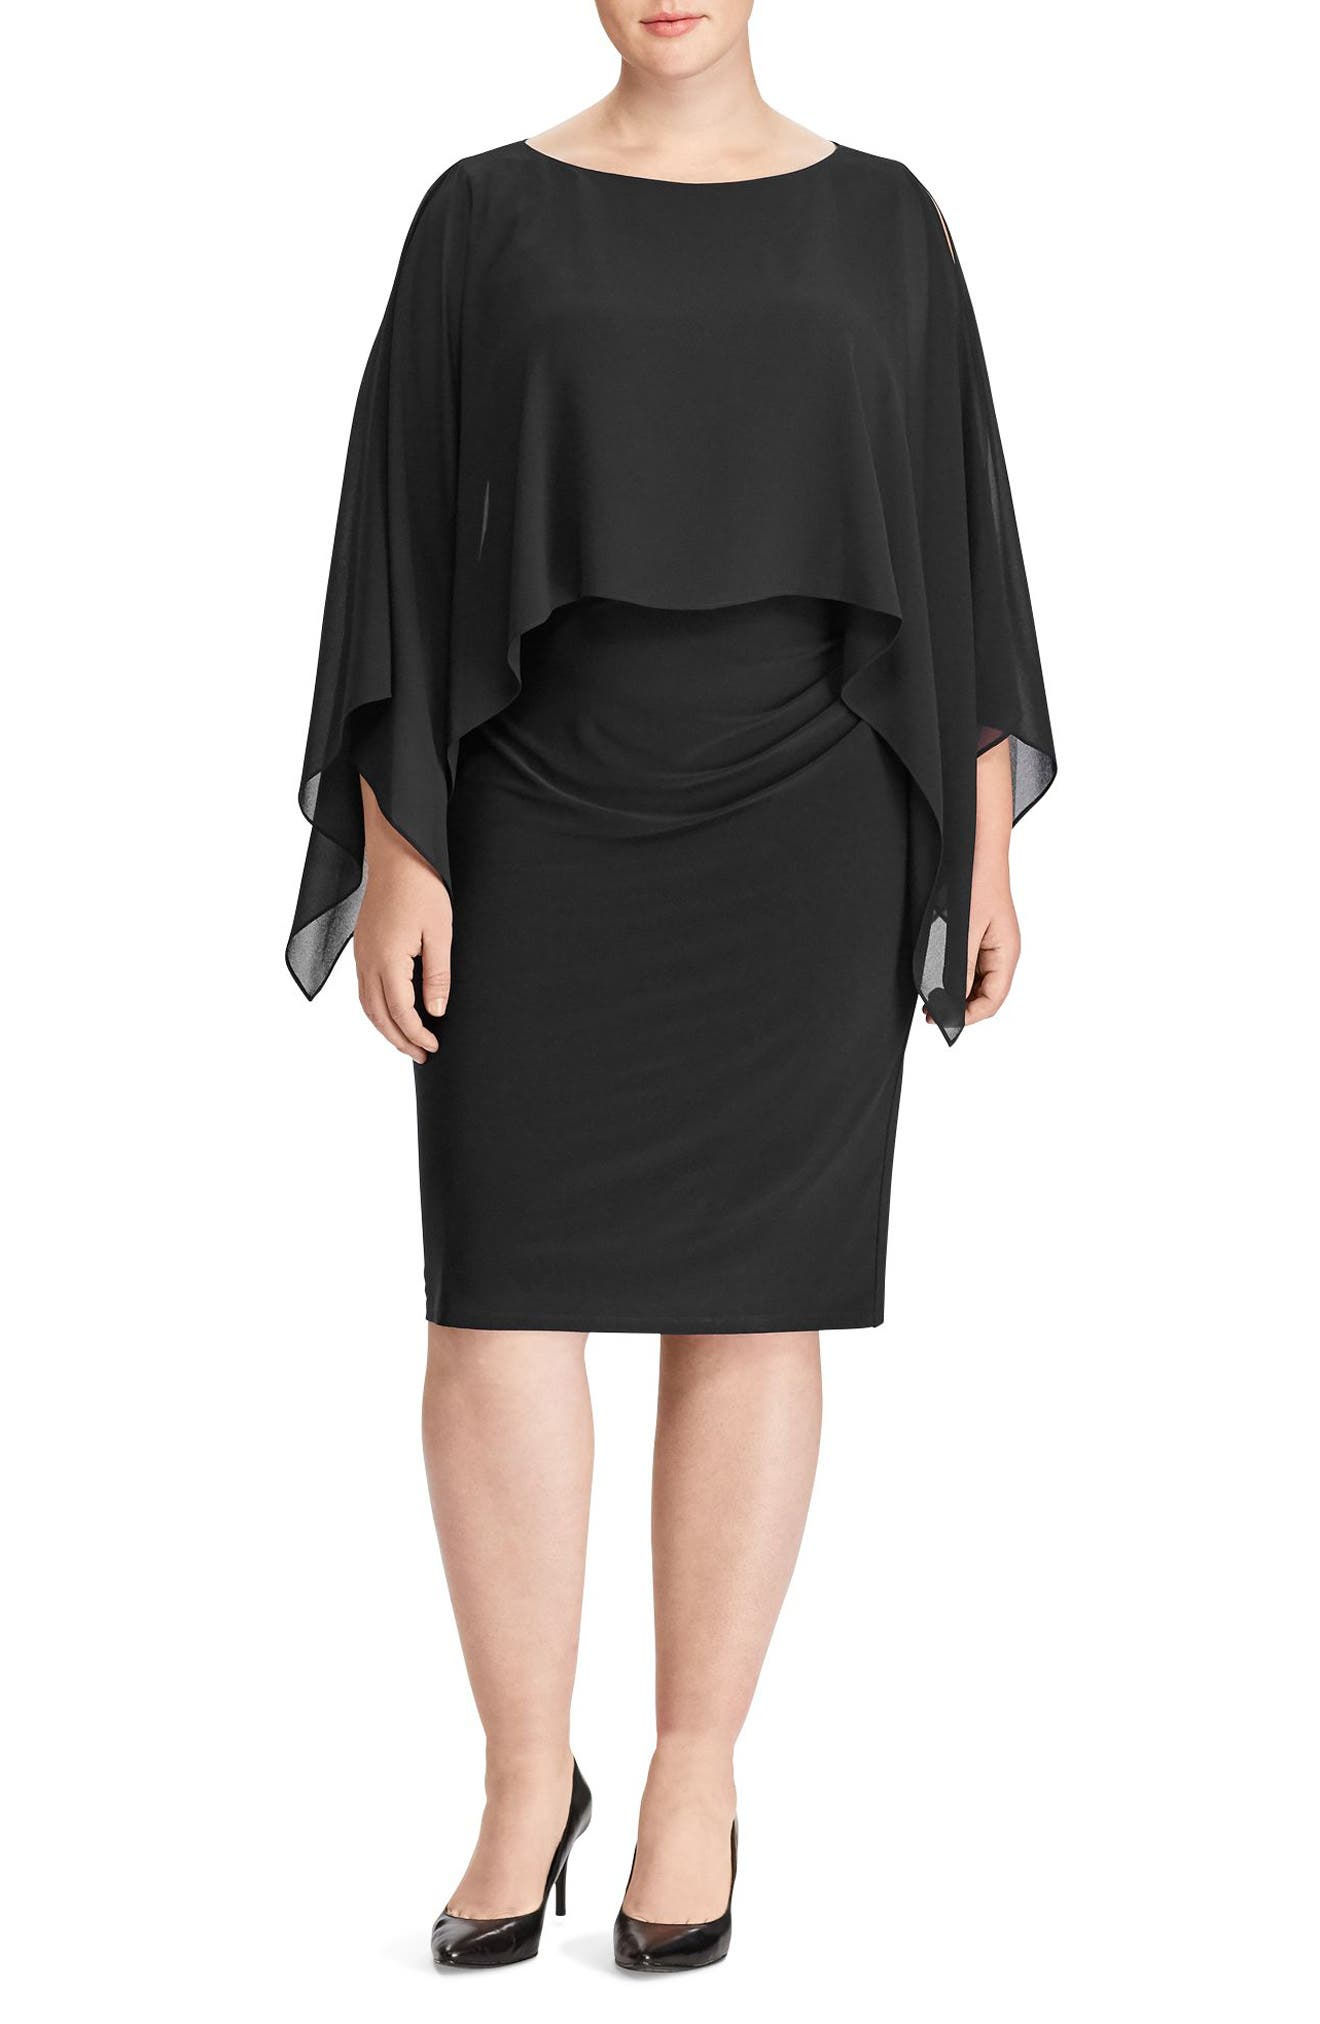 Mercinitta Dress,                             Main thumbnail 1, color,